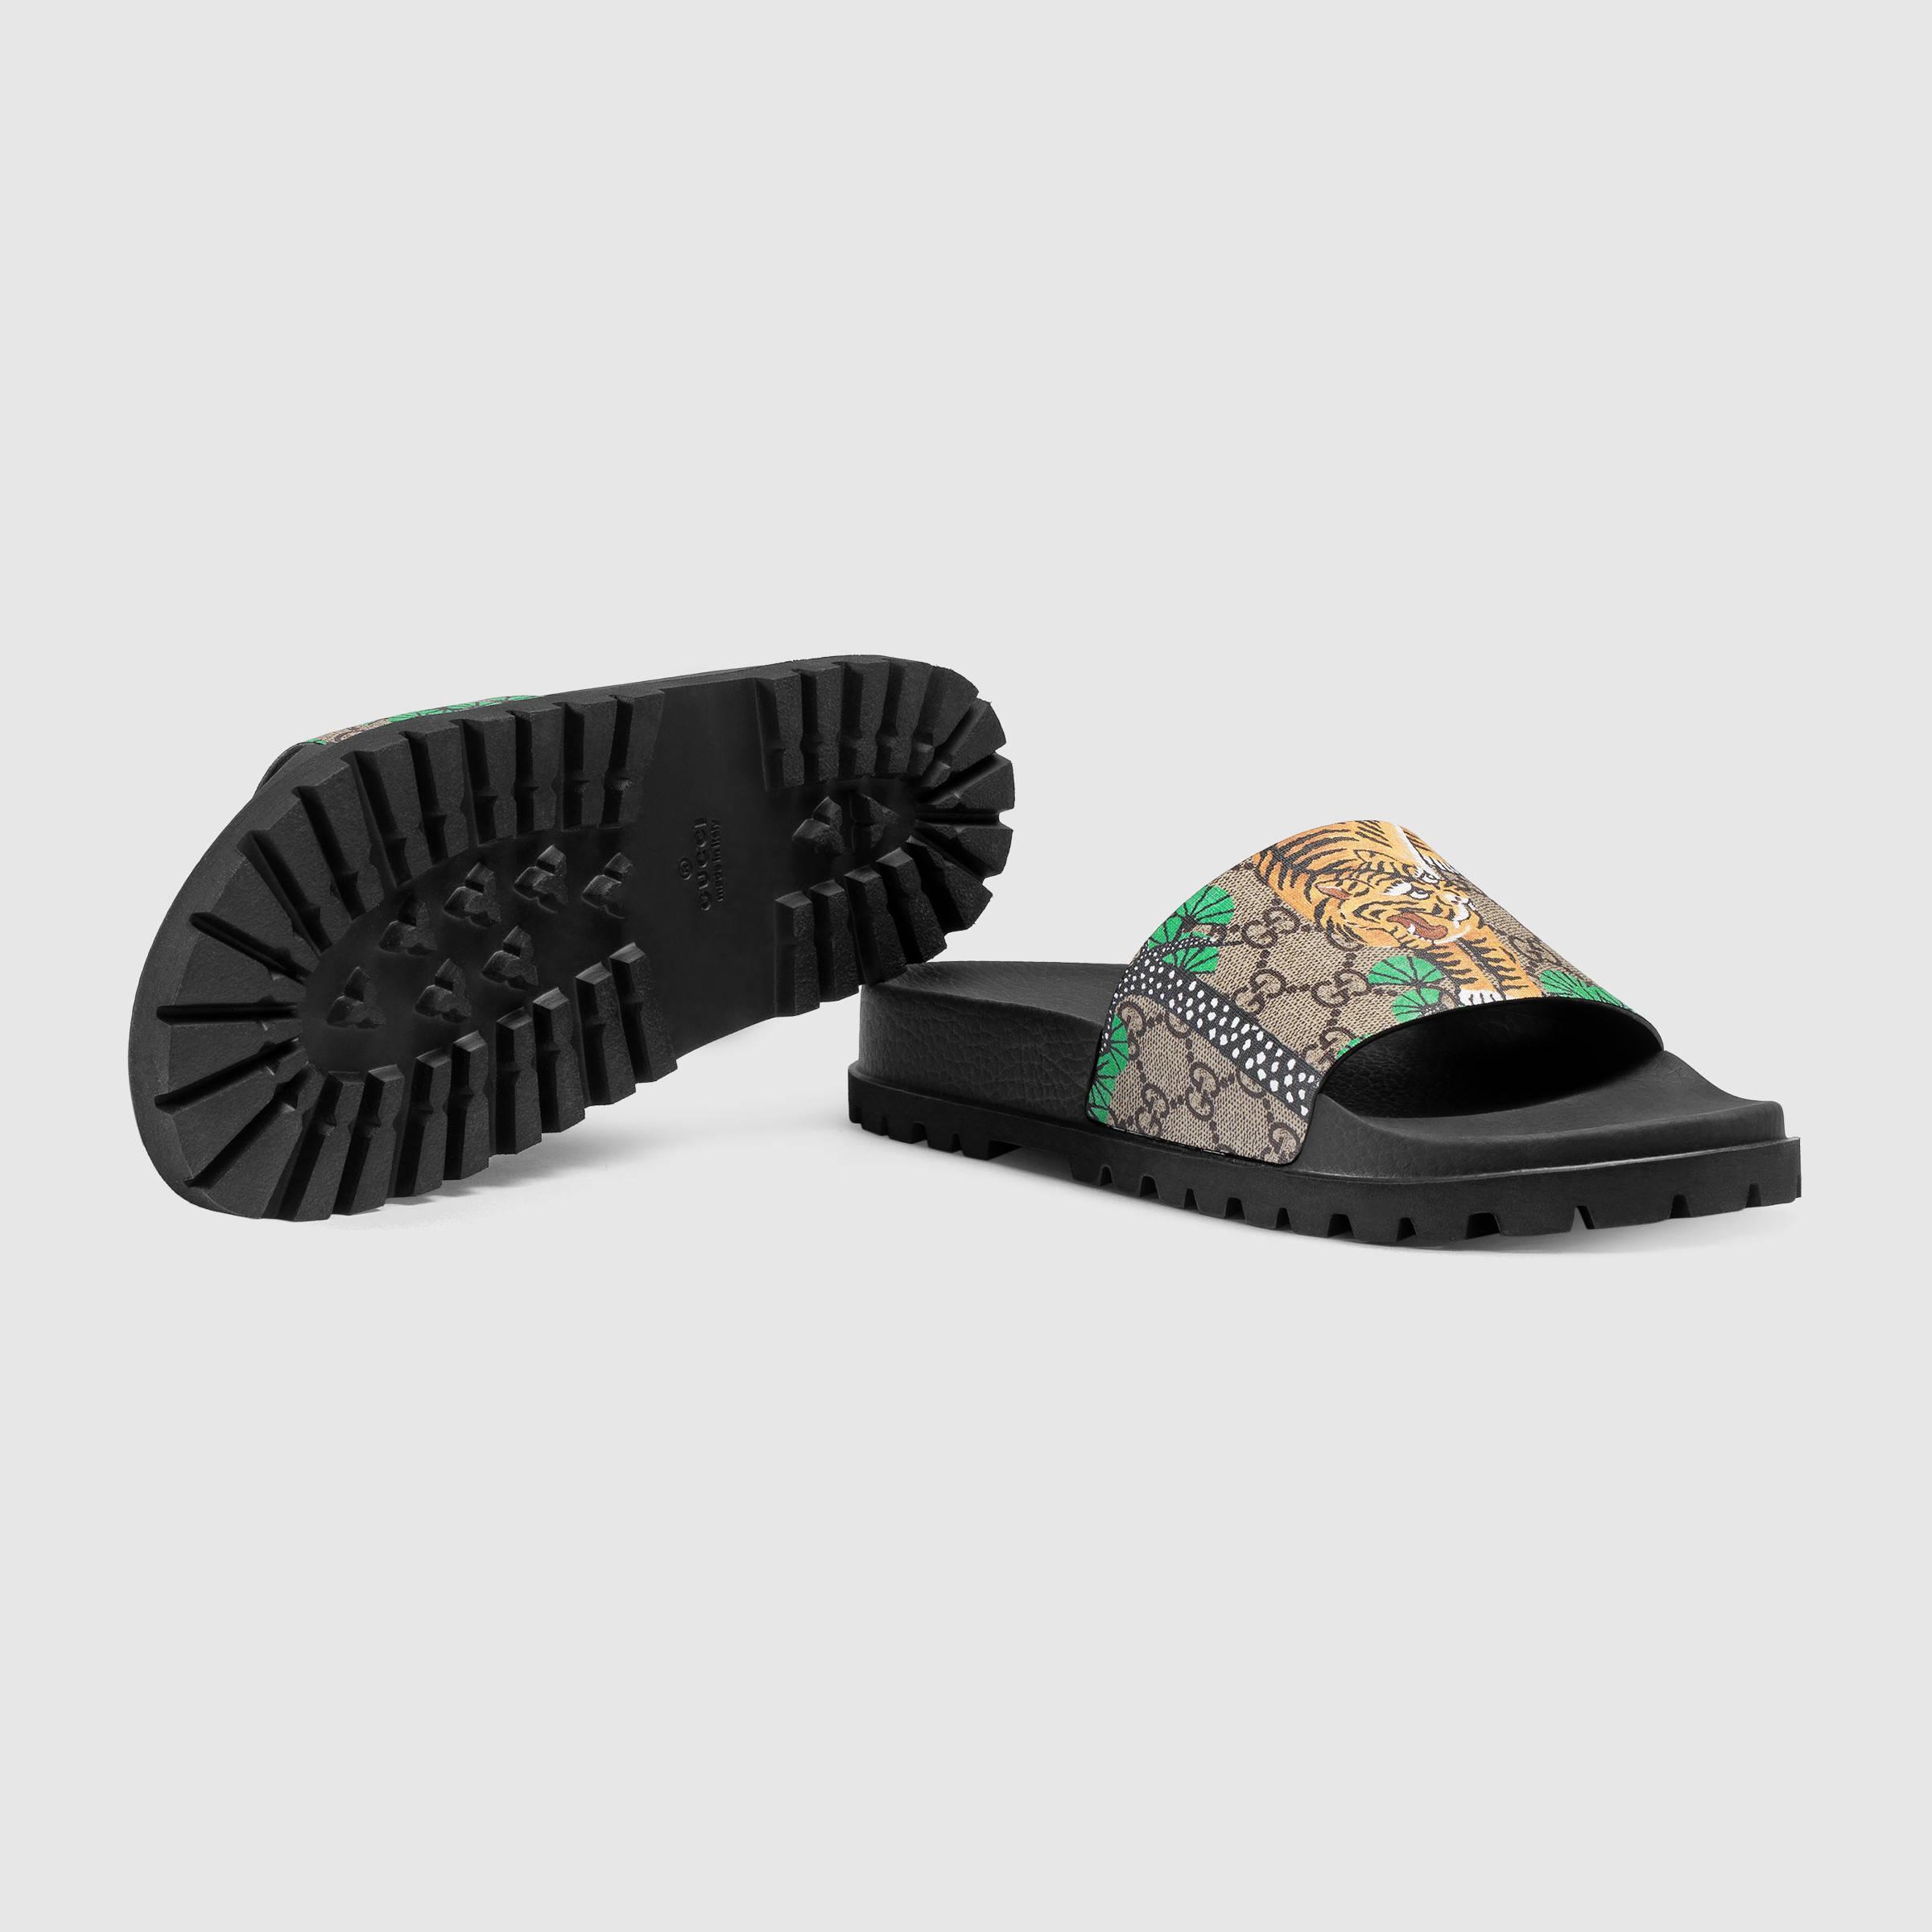 39dc8a7076bd0f Lyst - Gucci Bengal Slide Sandal